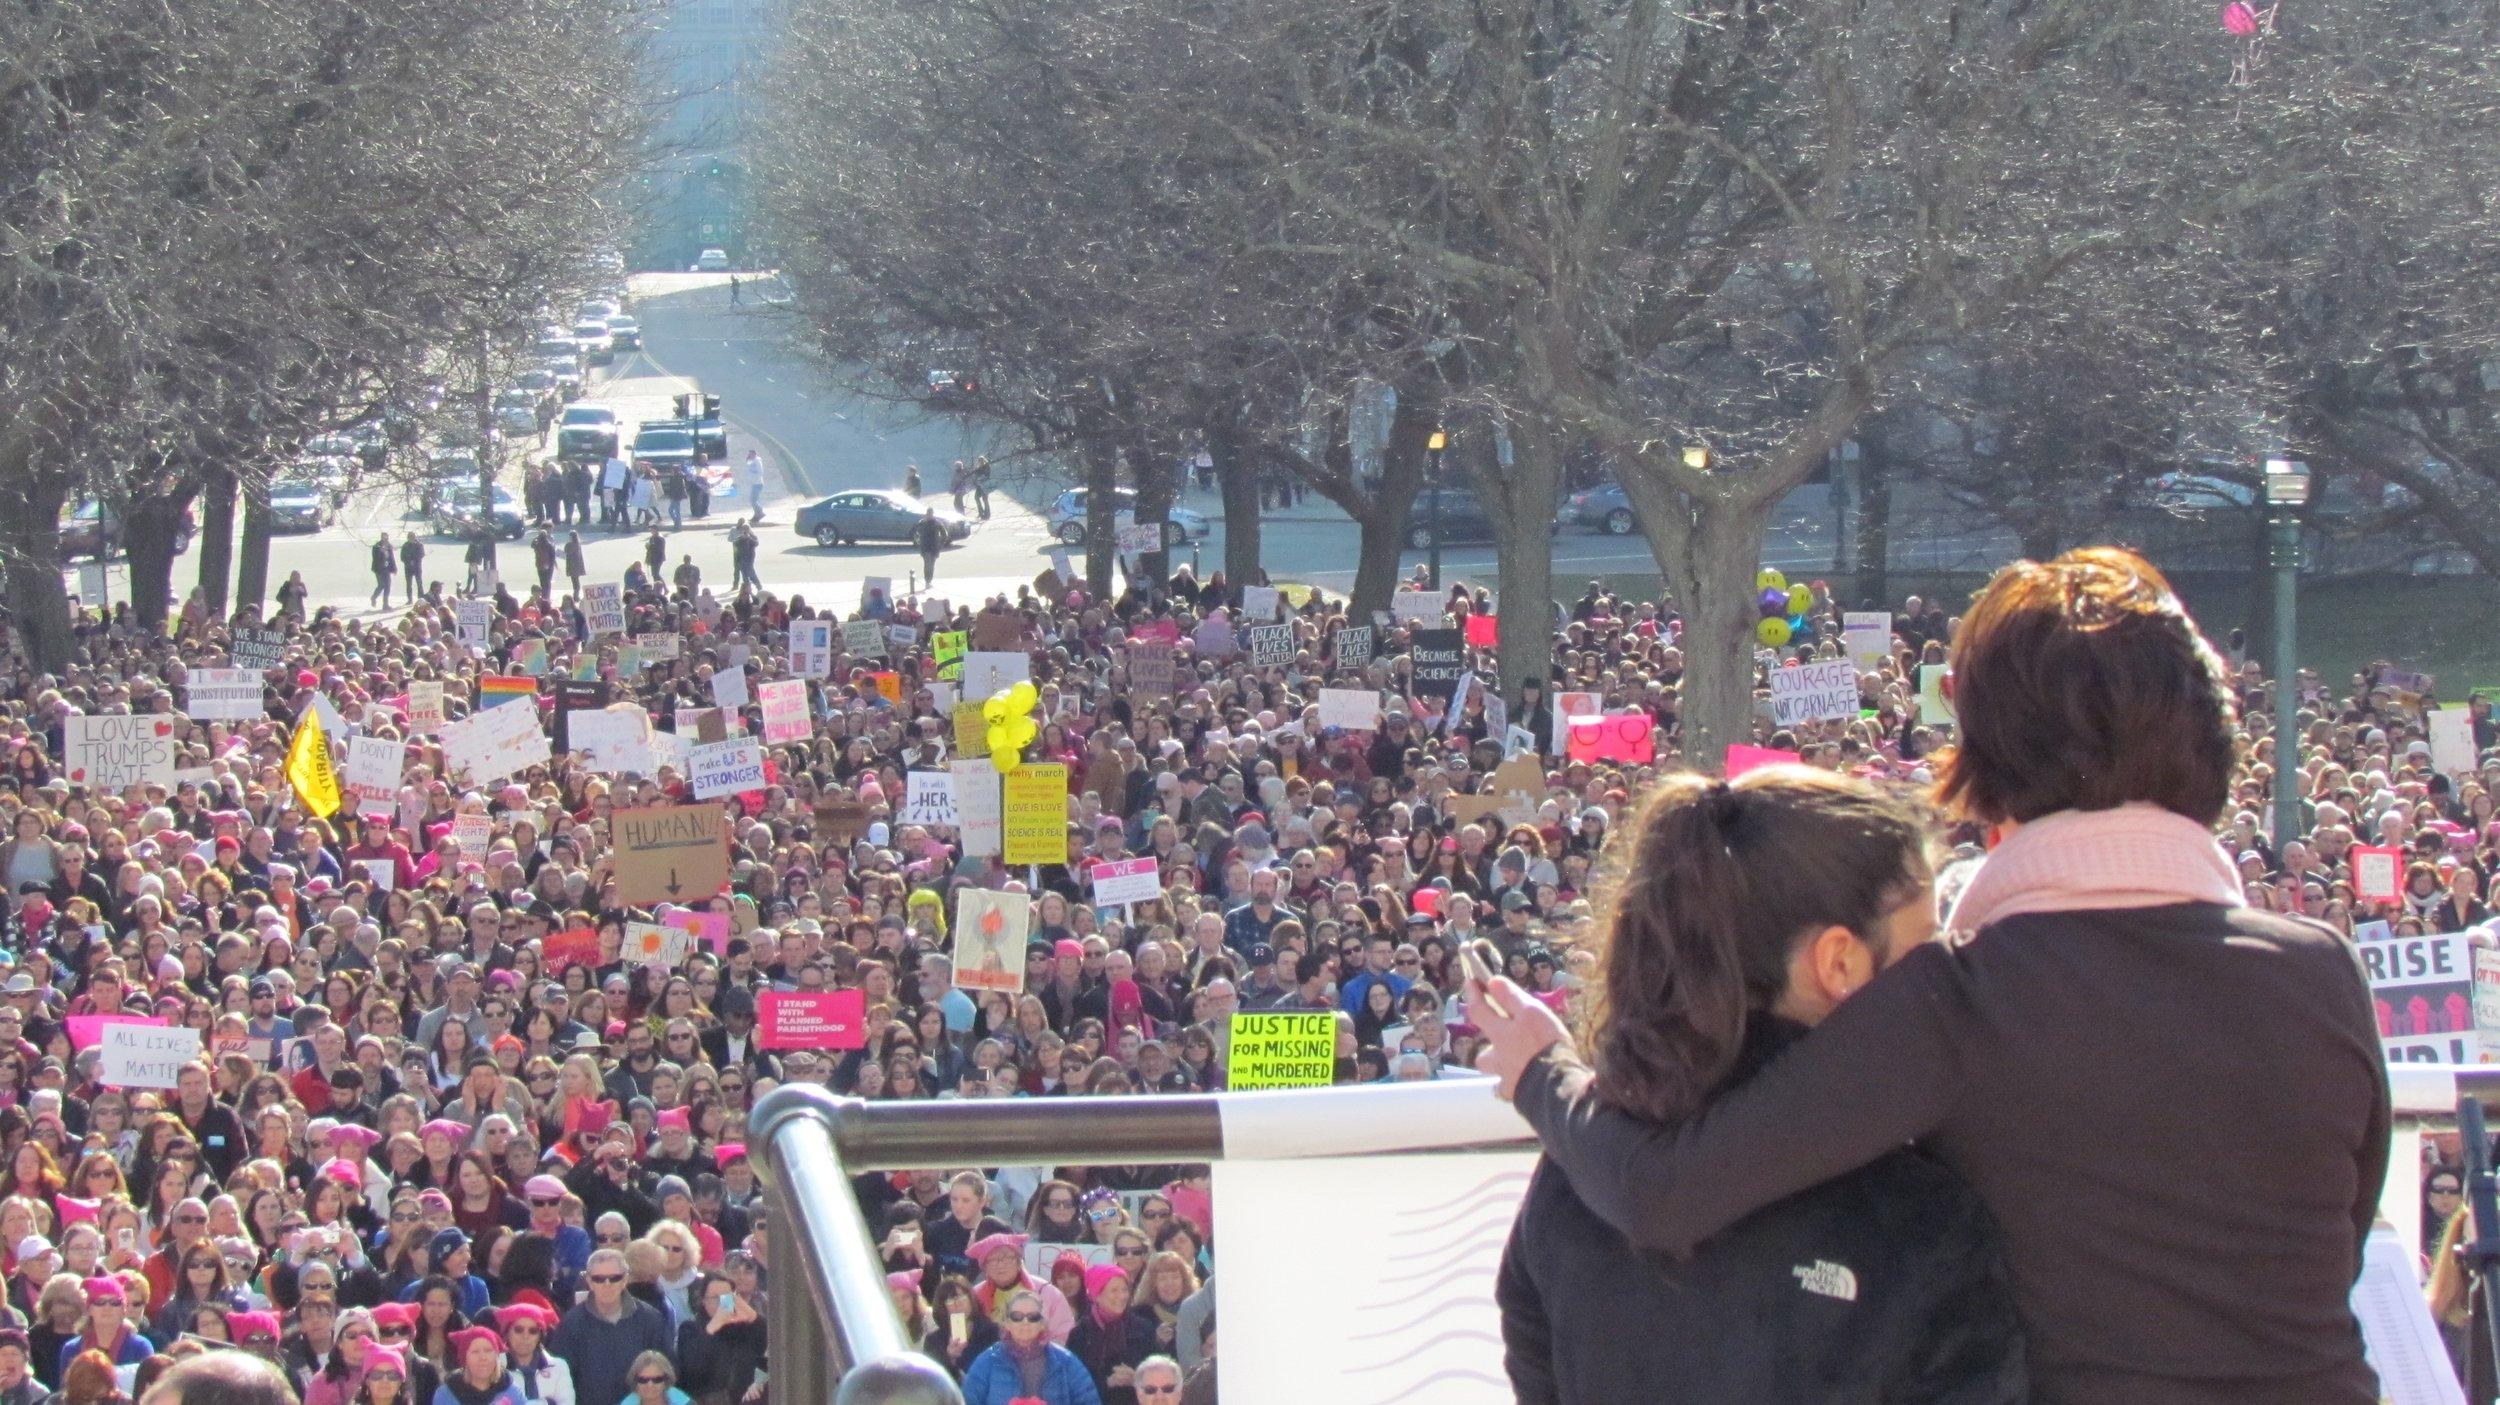 Gov. Gina Raimondo hugs daughter Ceci during the Jan. 21 Rally for Women's Solidarity at the Rhode Island Statehouse. (Tim Faulkner/ecoRI News photos)